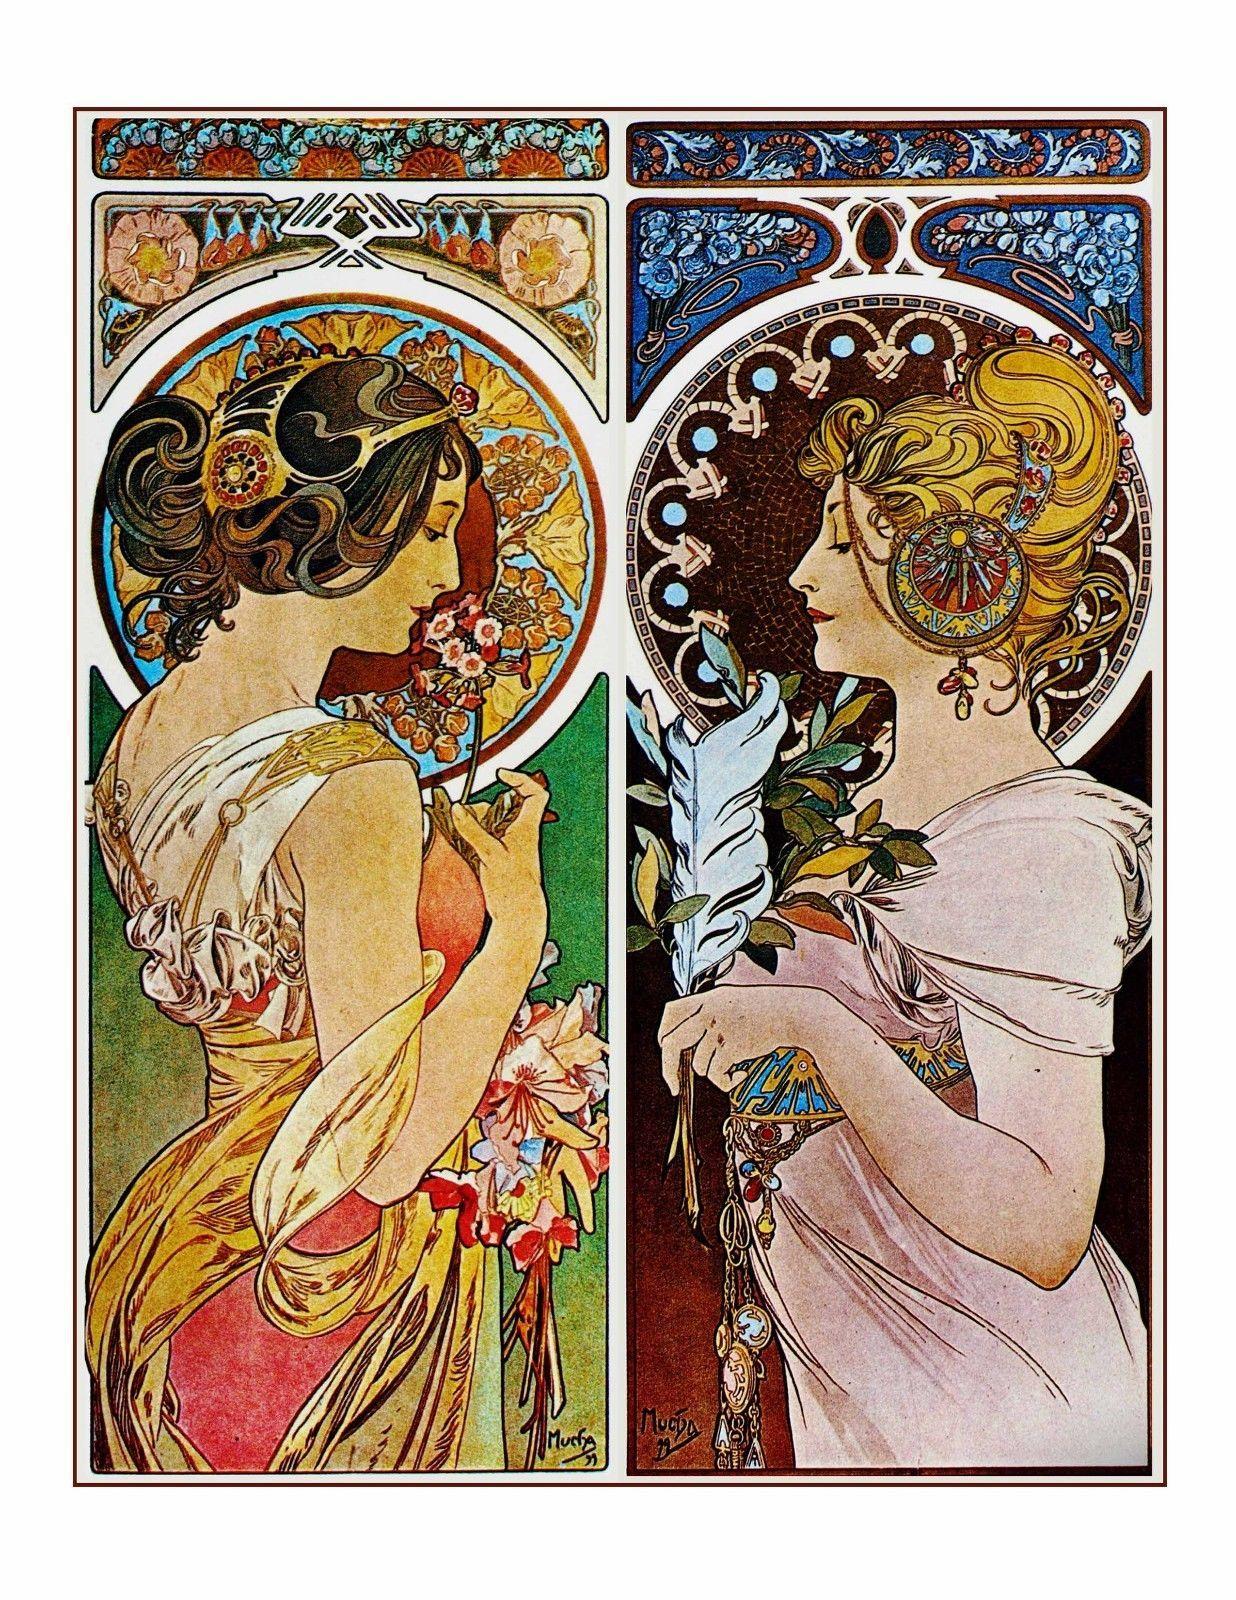 Art Nouveau Alphonse Mucha Print 2 Beautiful Woman Together Love Friends 8 10 713331228363 Ebay Art Nouveau Mucha Mucha Art Alphonse Mucha